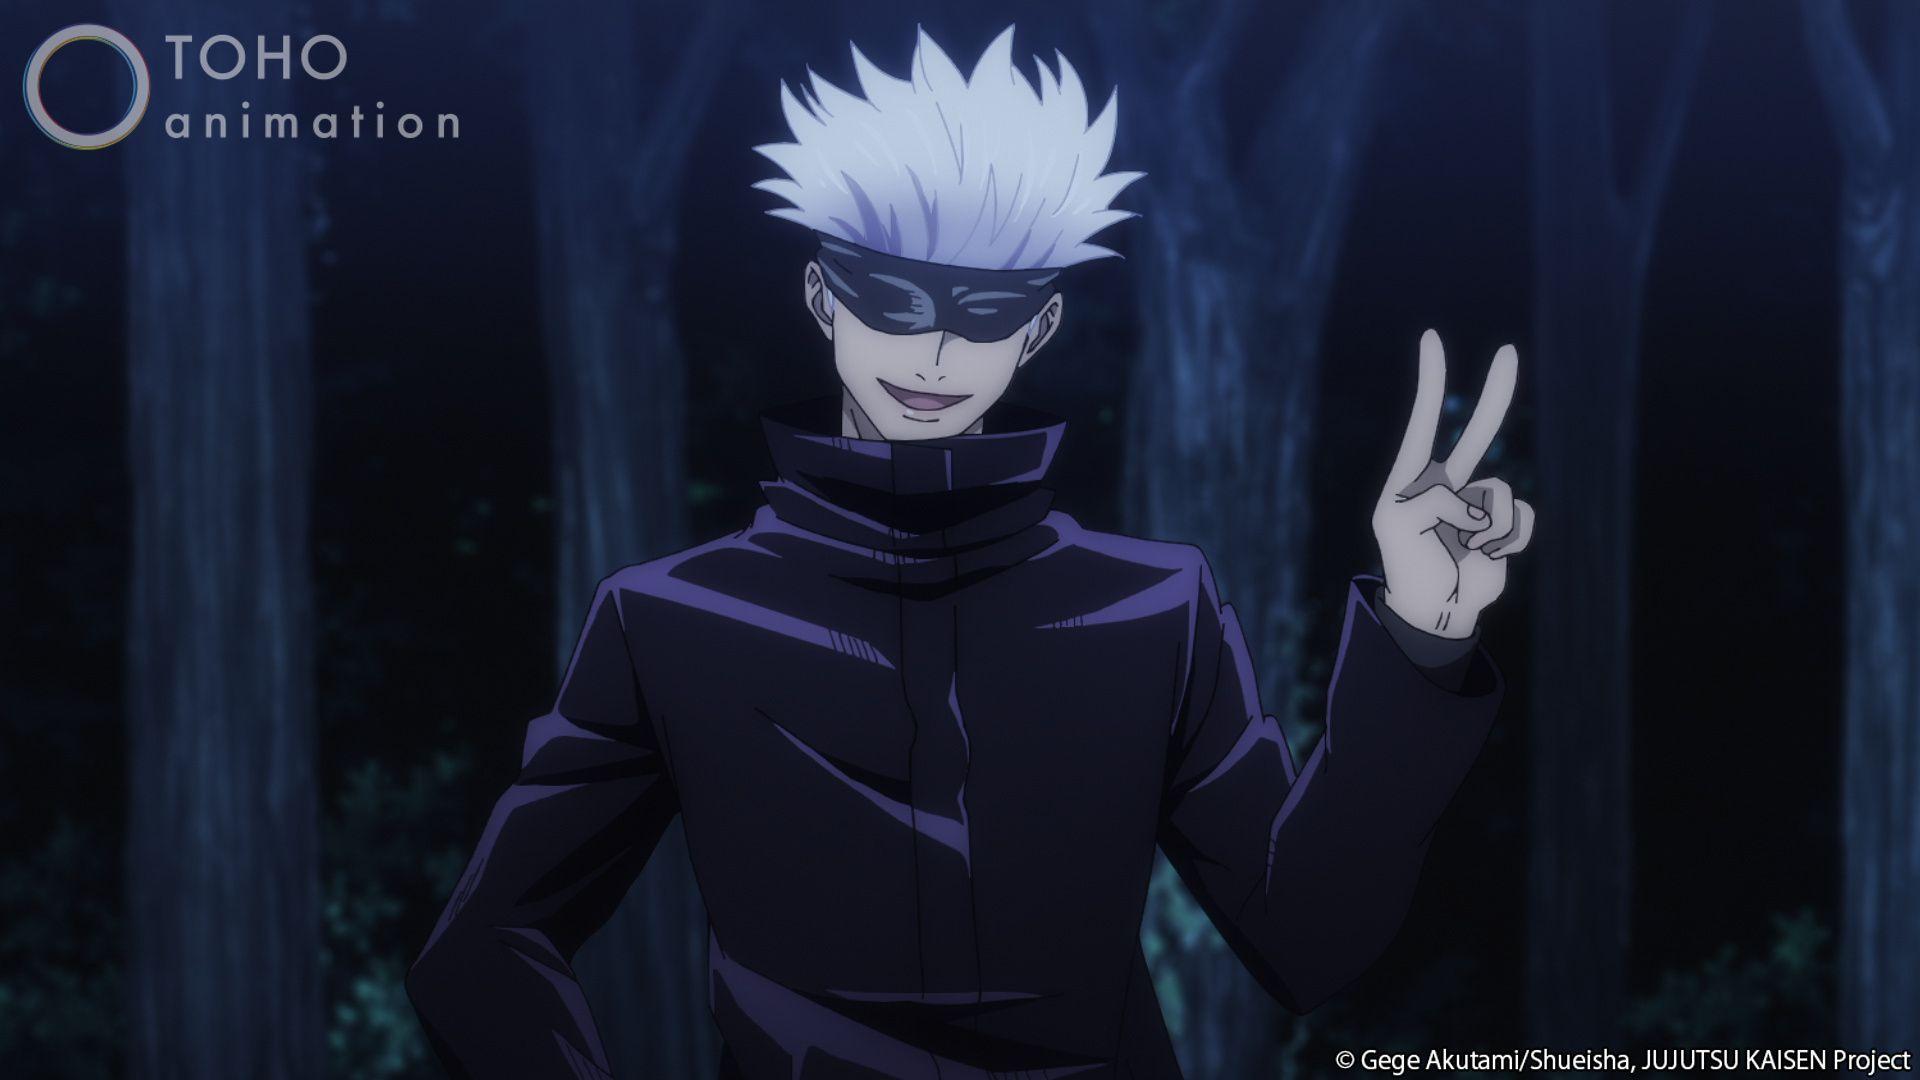 Jujutsu Kaisen On Twitter In 2021 Jujutsu Anime People Anime Films